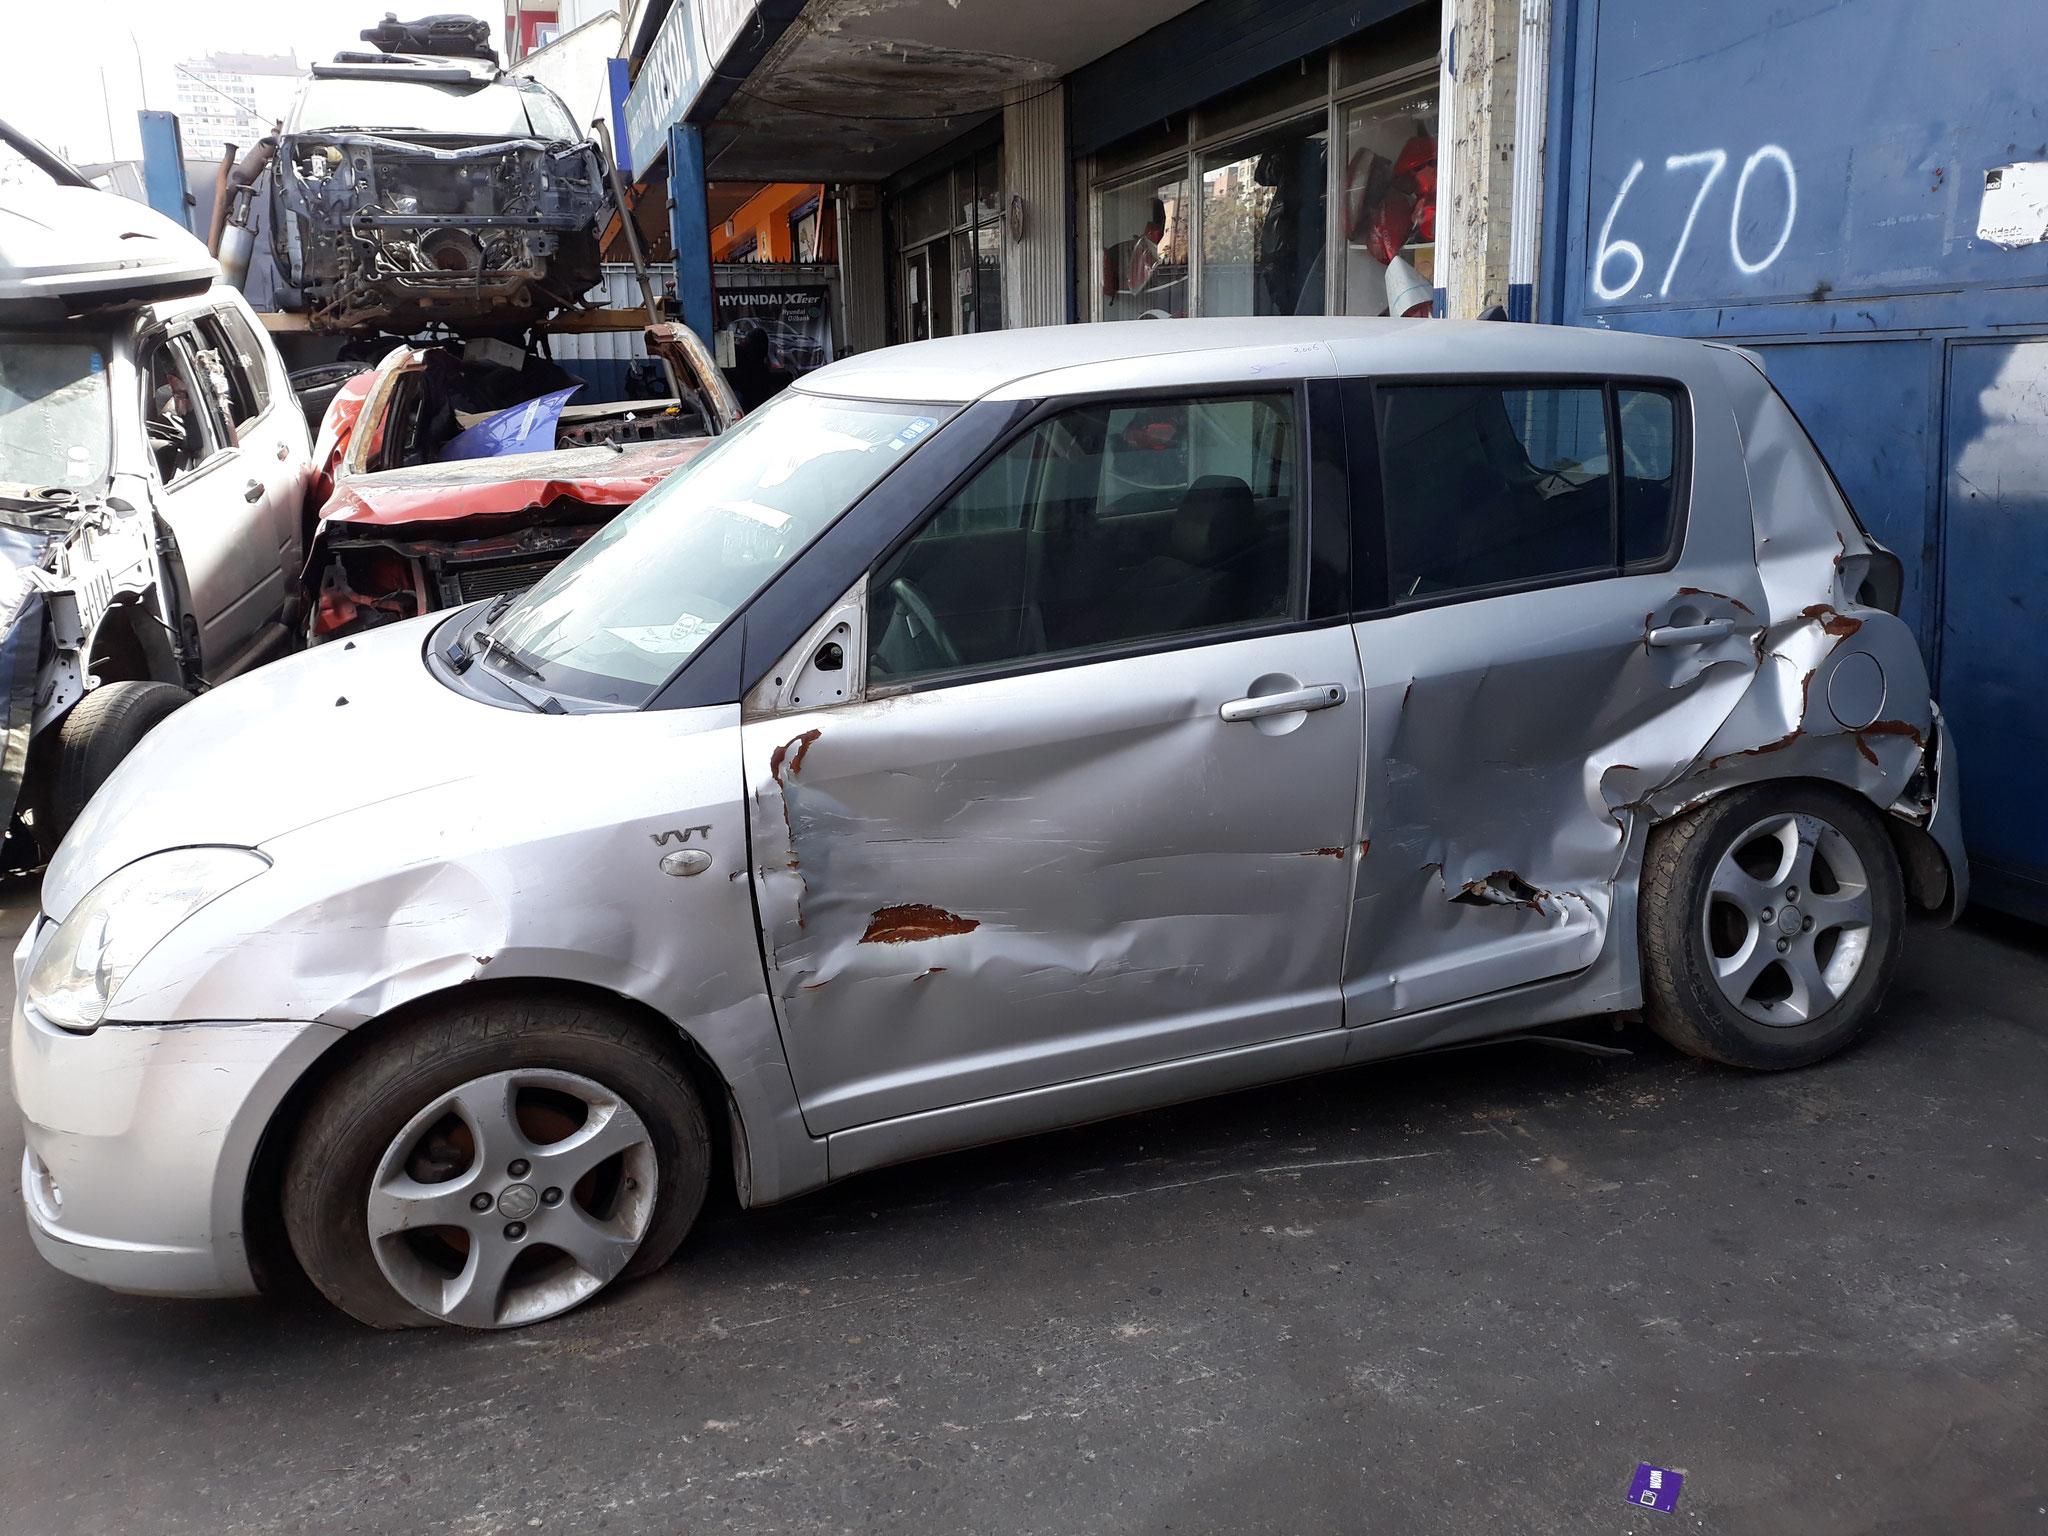 SUZUKI SWIFT AÑO 2006 1.5 EN DESARME